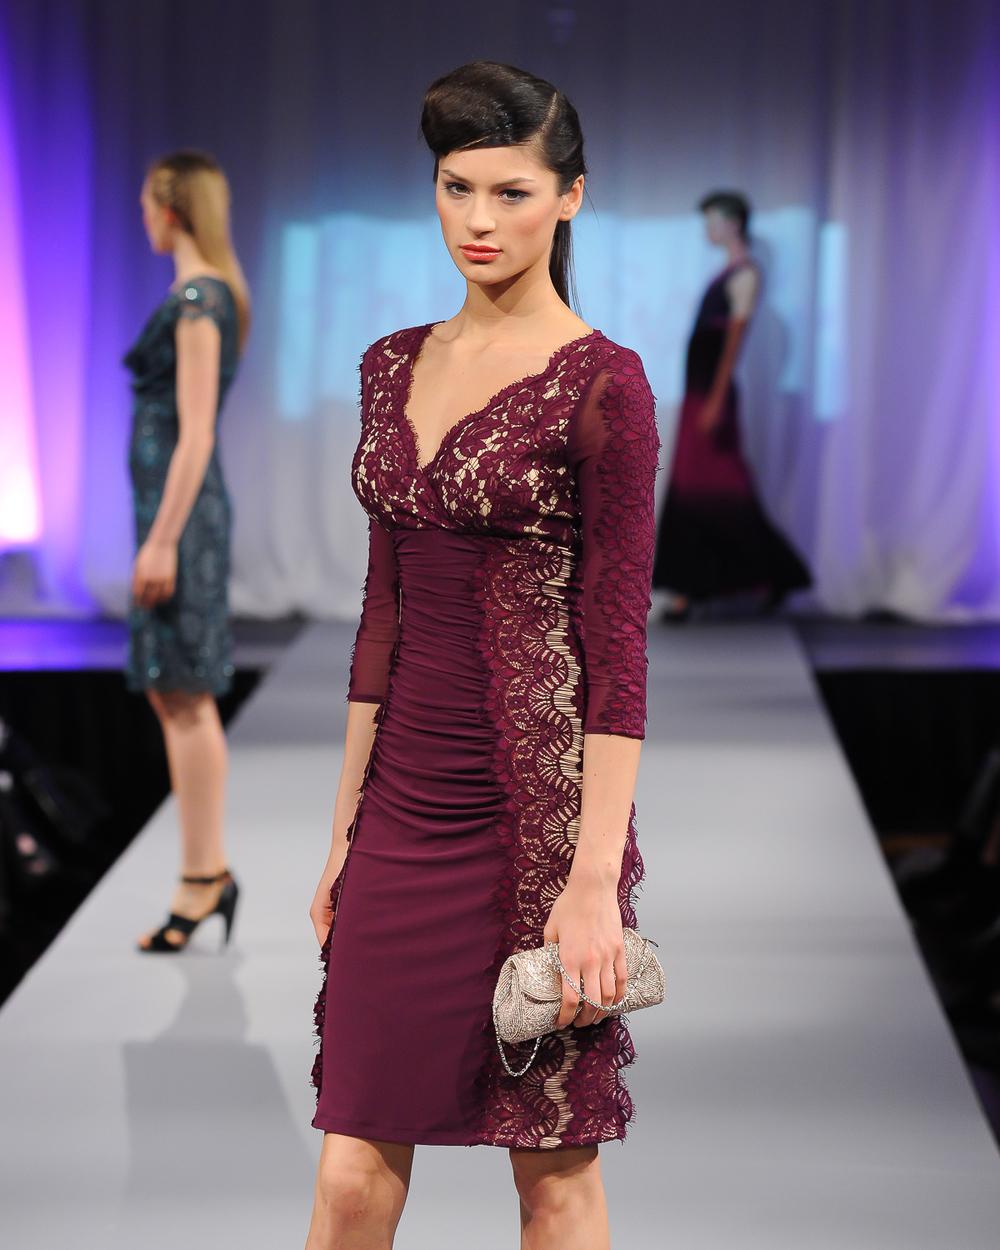 bristol-fashion-photographer-17.jpg